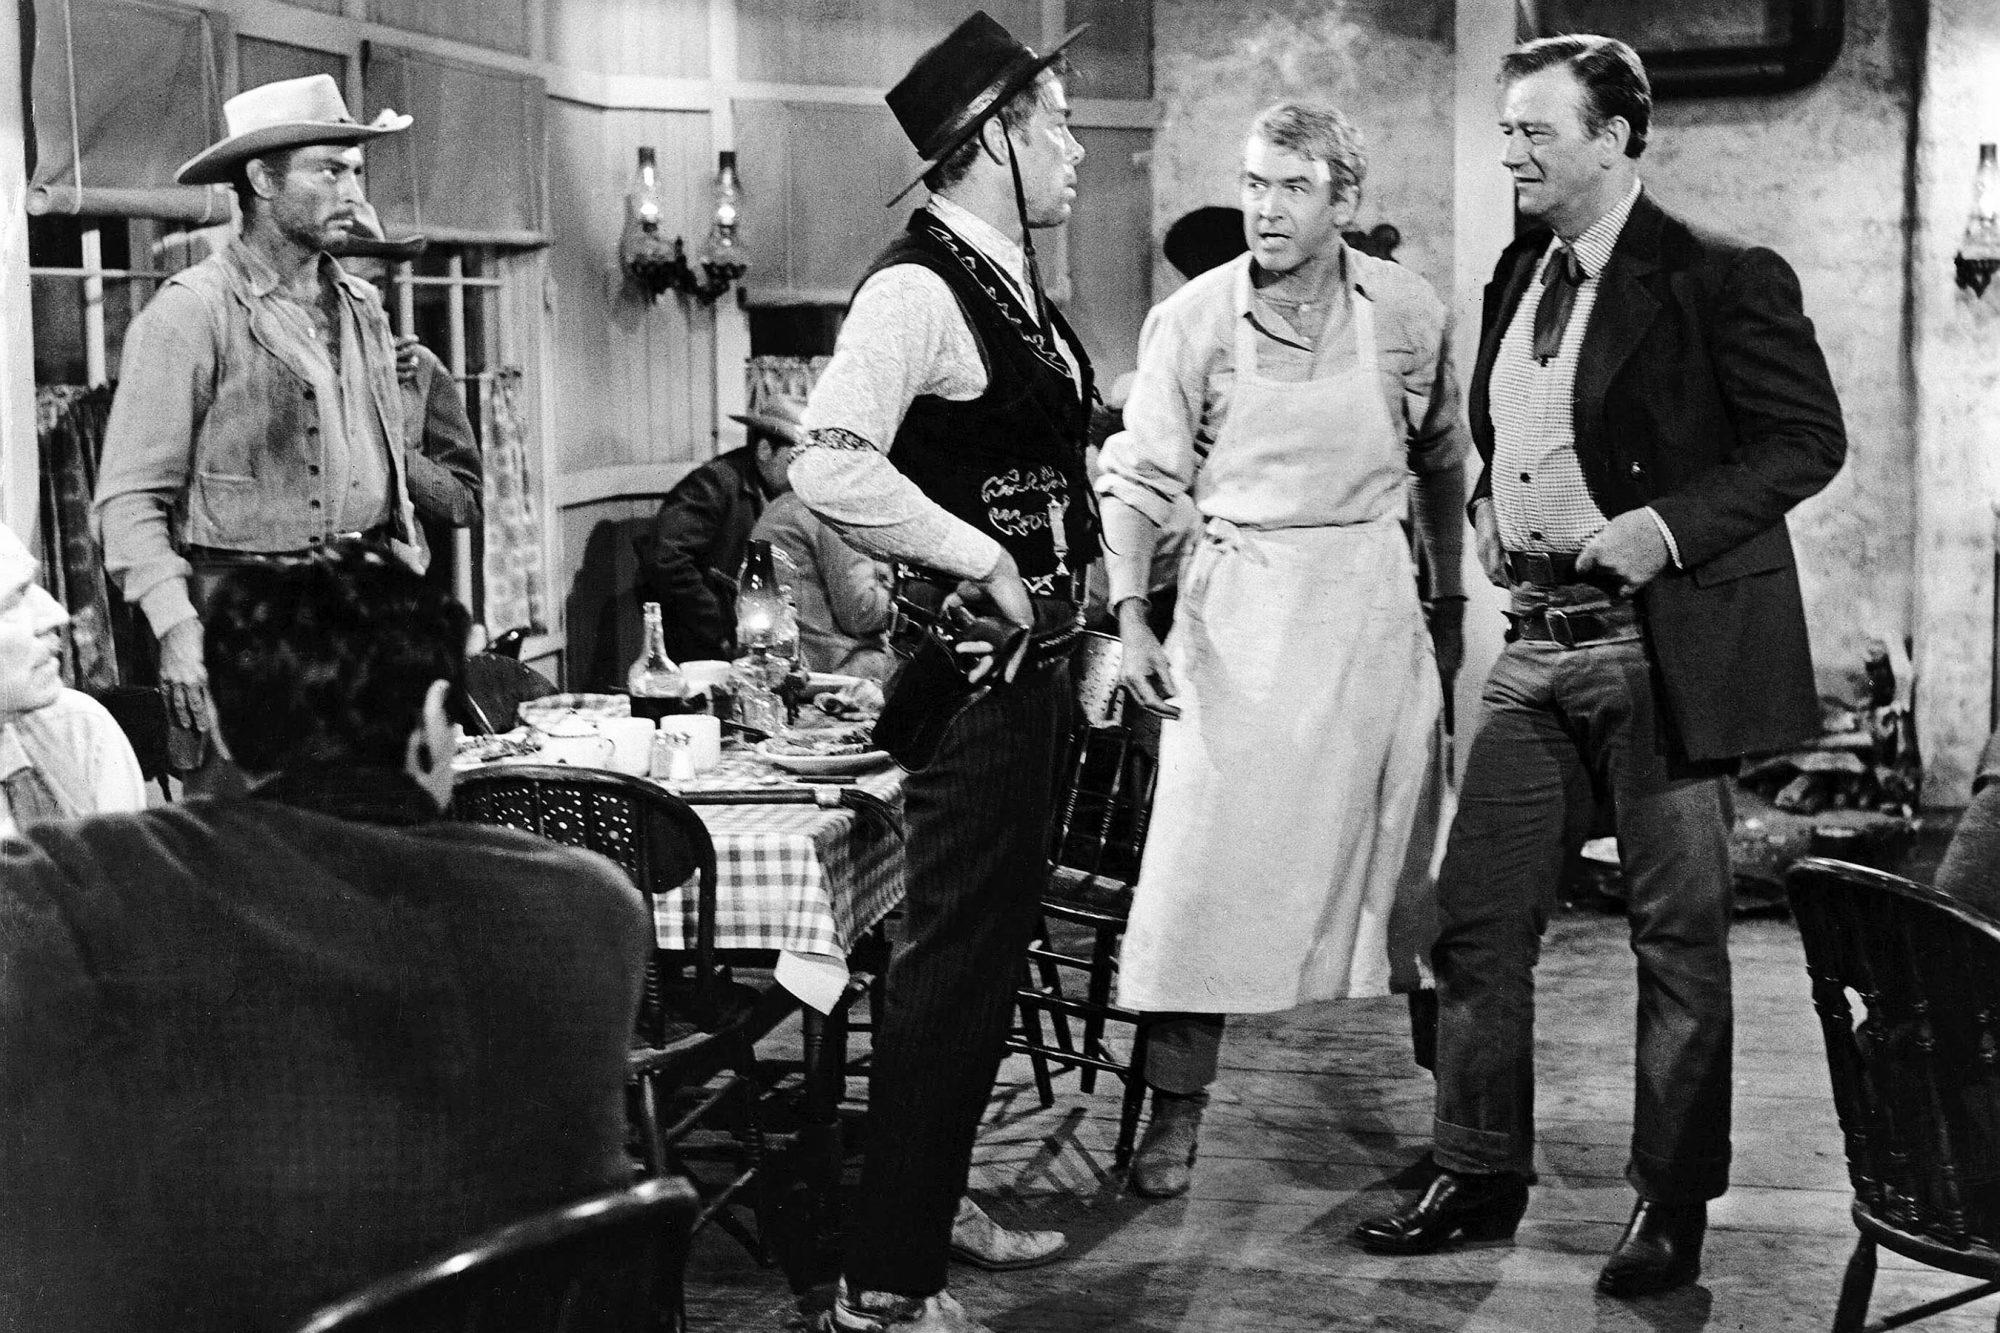 The Man Who Shot Liberty Valance - 1962